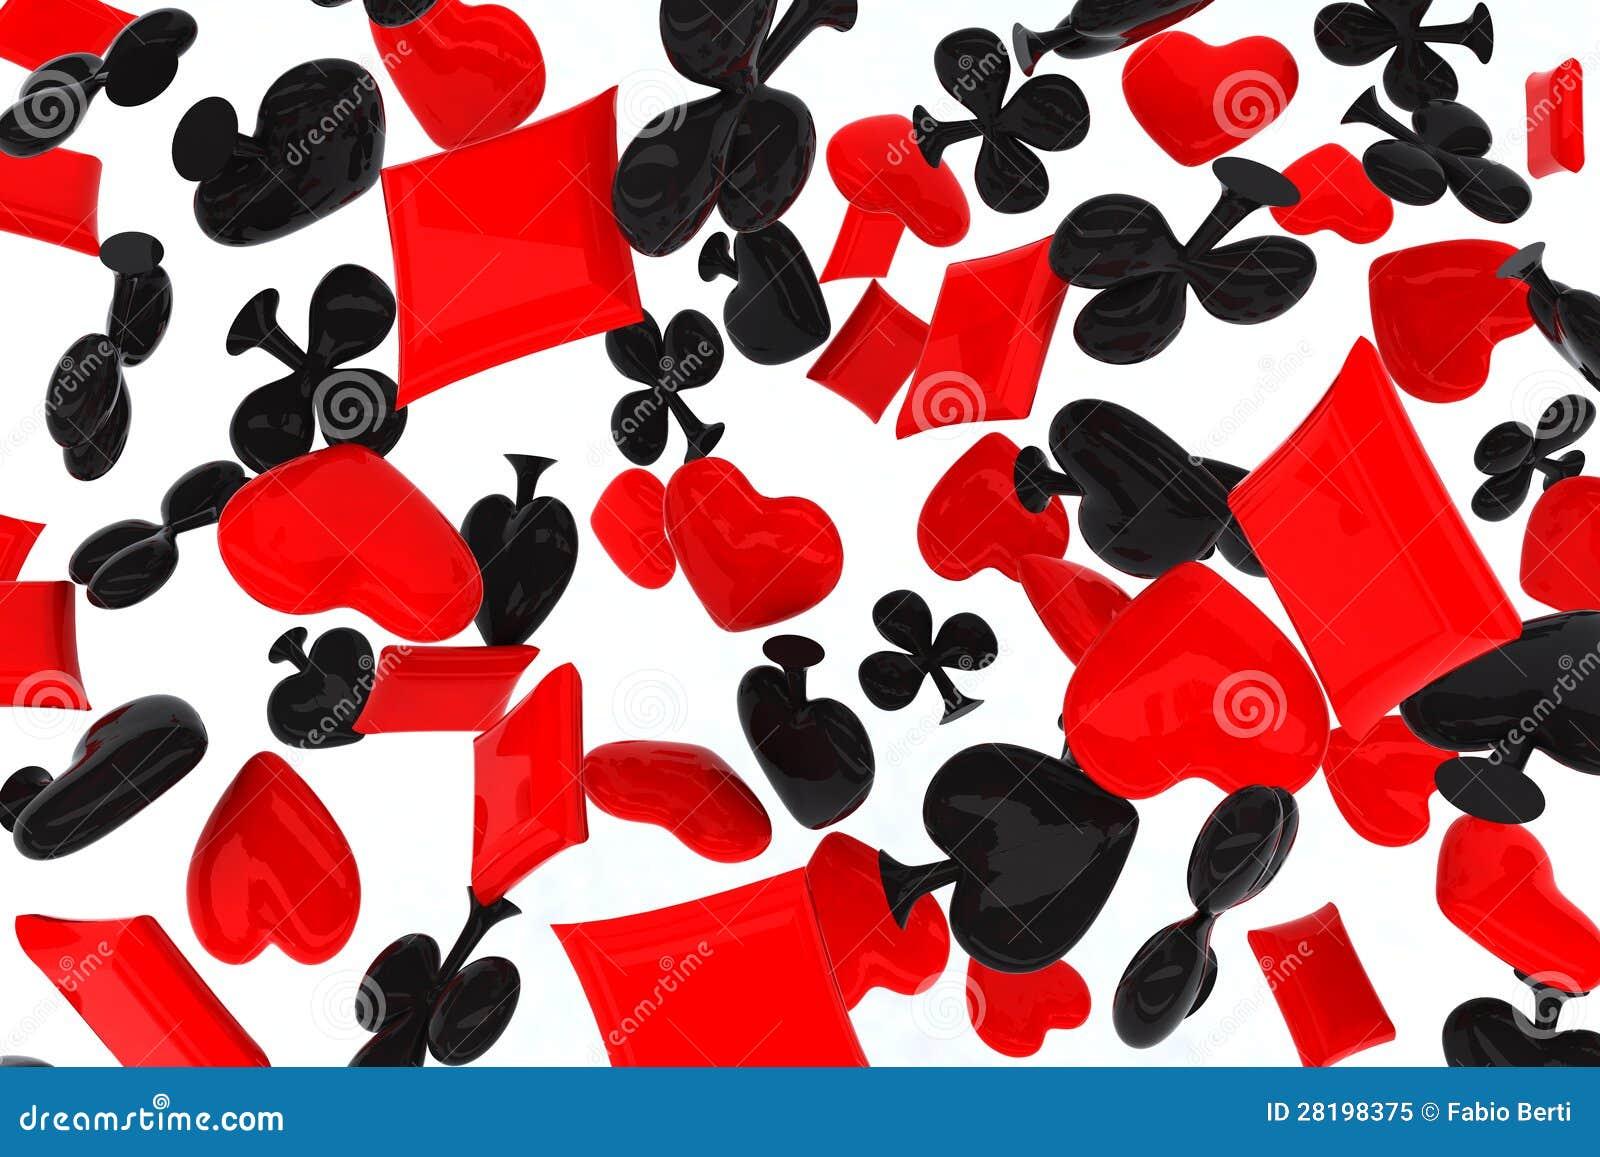 symbole de cartes de jeu 3d illustration stock image 28198375. Black Bedroom Furniture Sets. Home Design Ideas